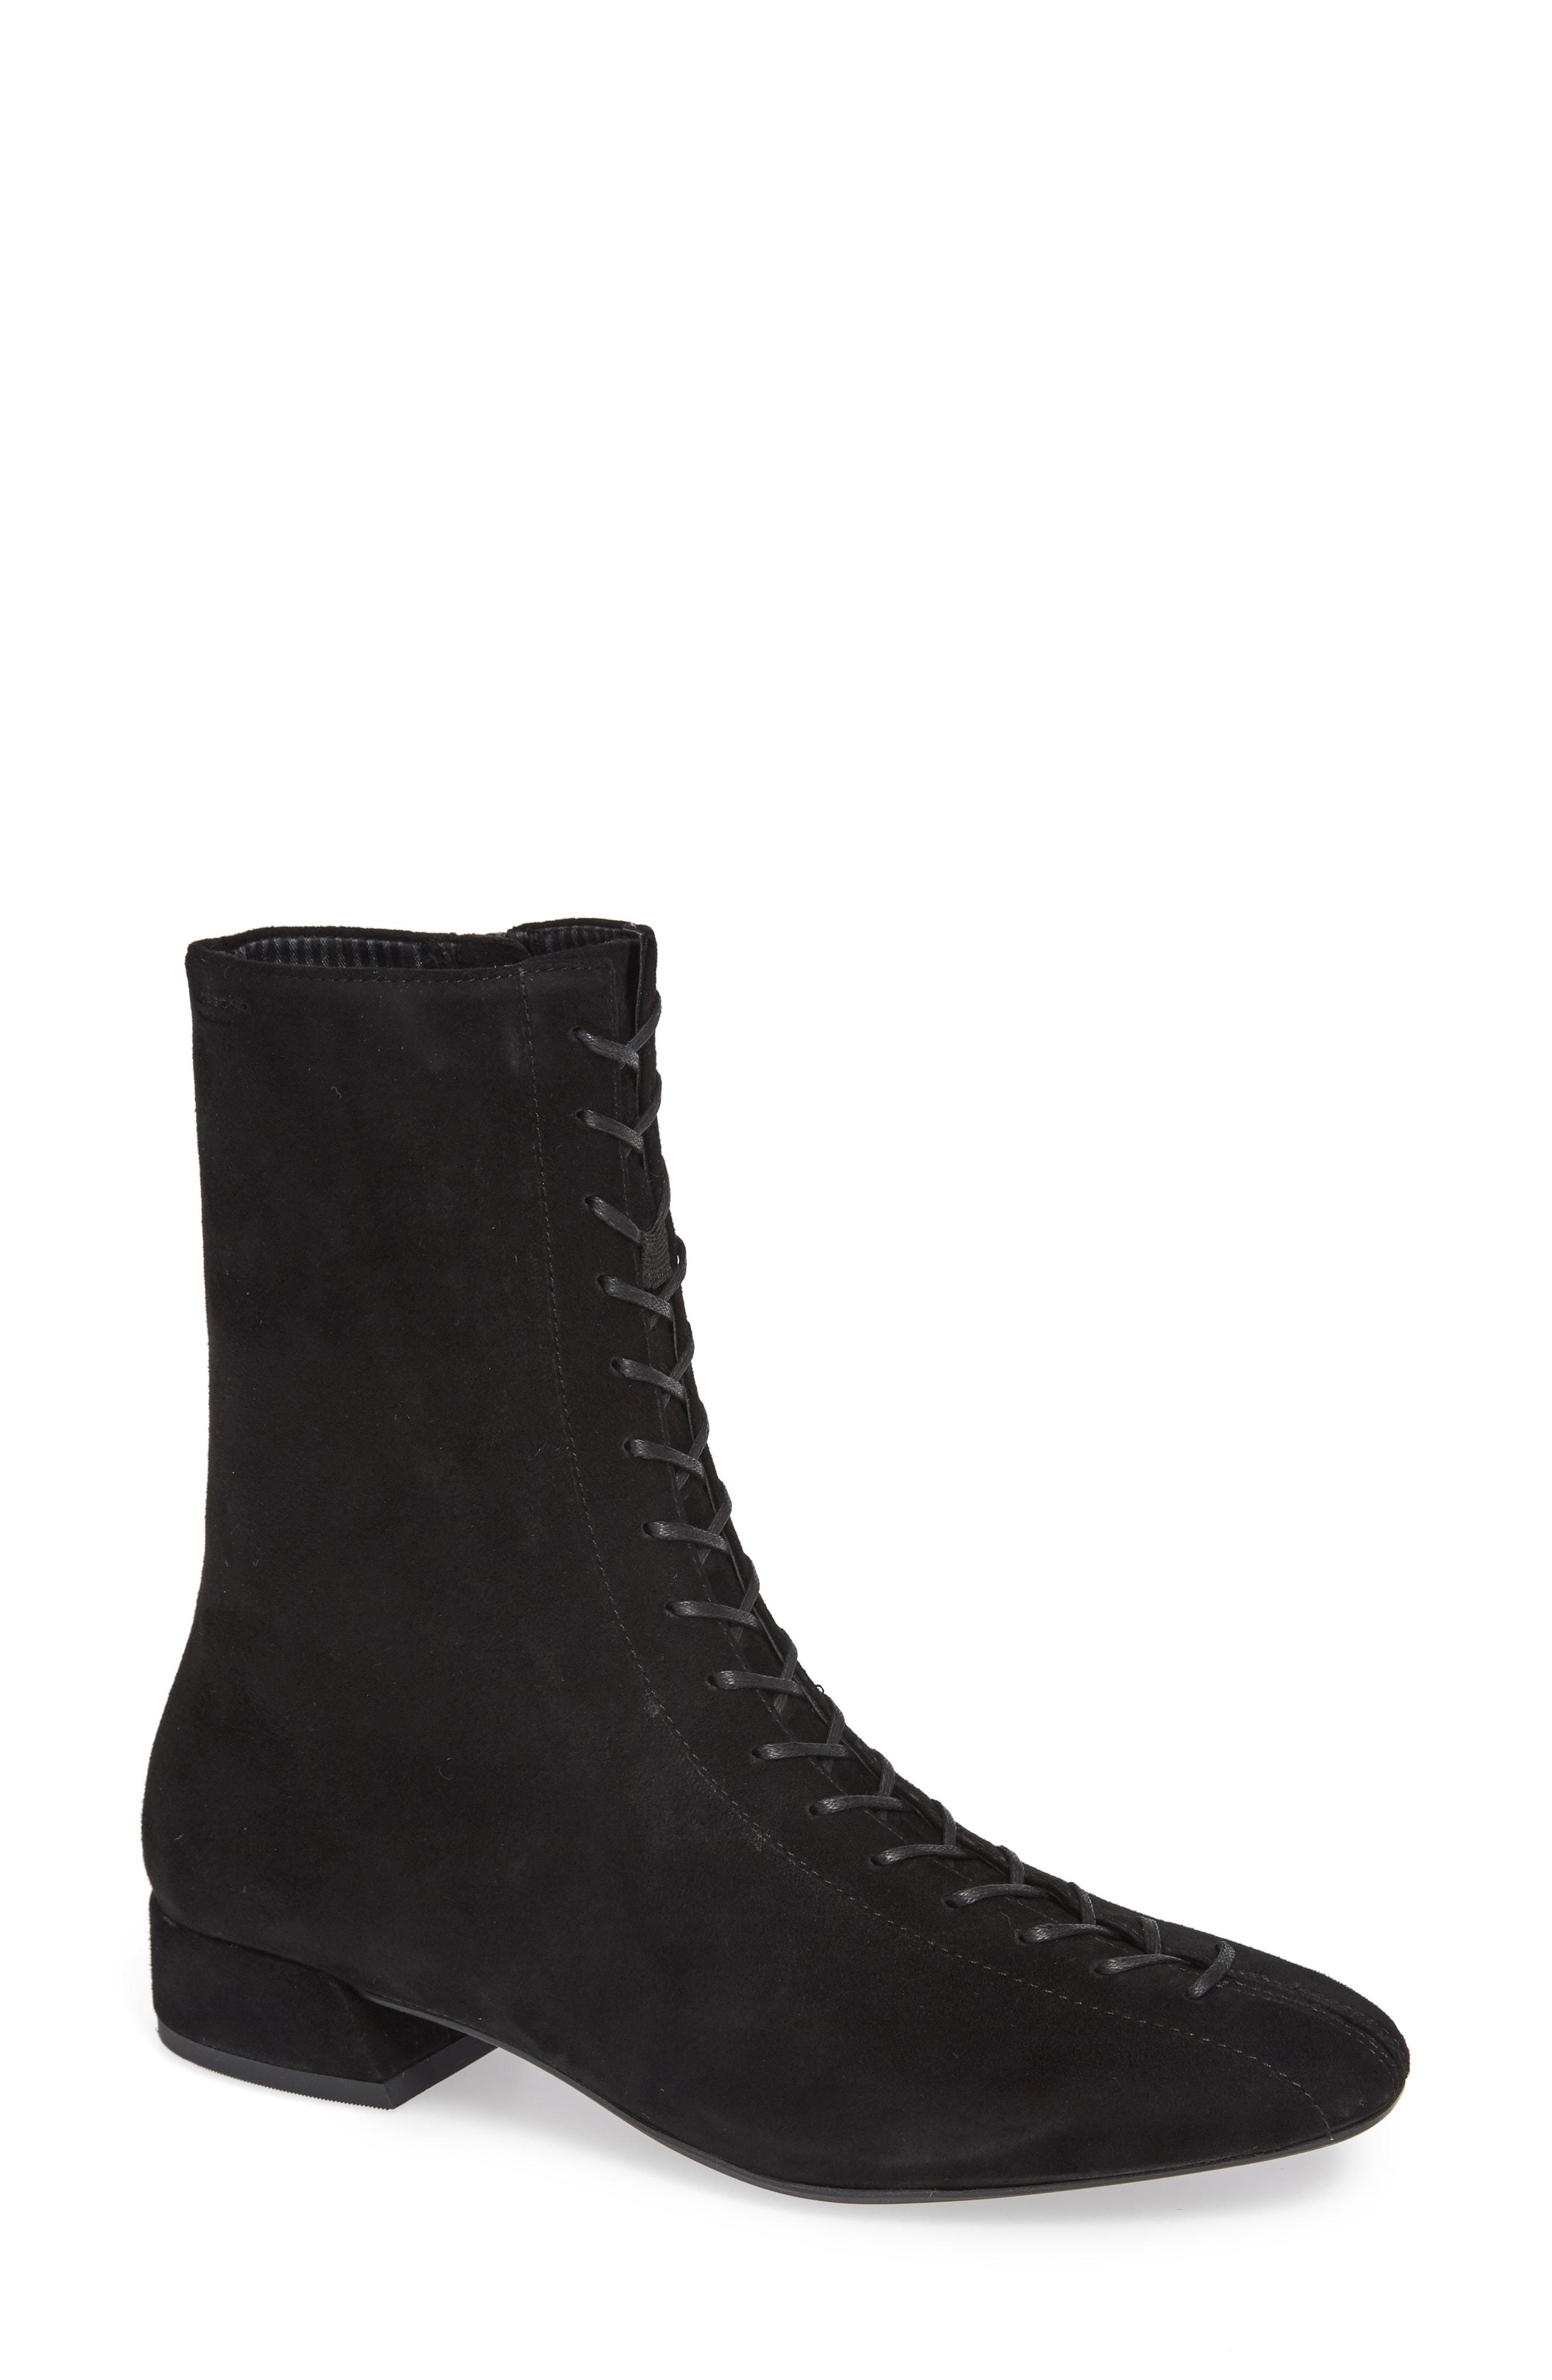 099e0115557 Lyst - Vagabond Shoemakers Joyce Lace-up Bootie in Black